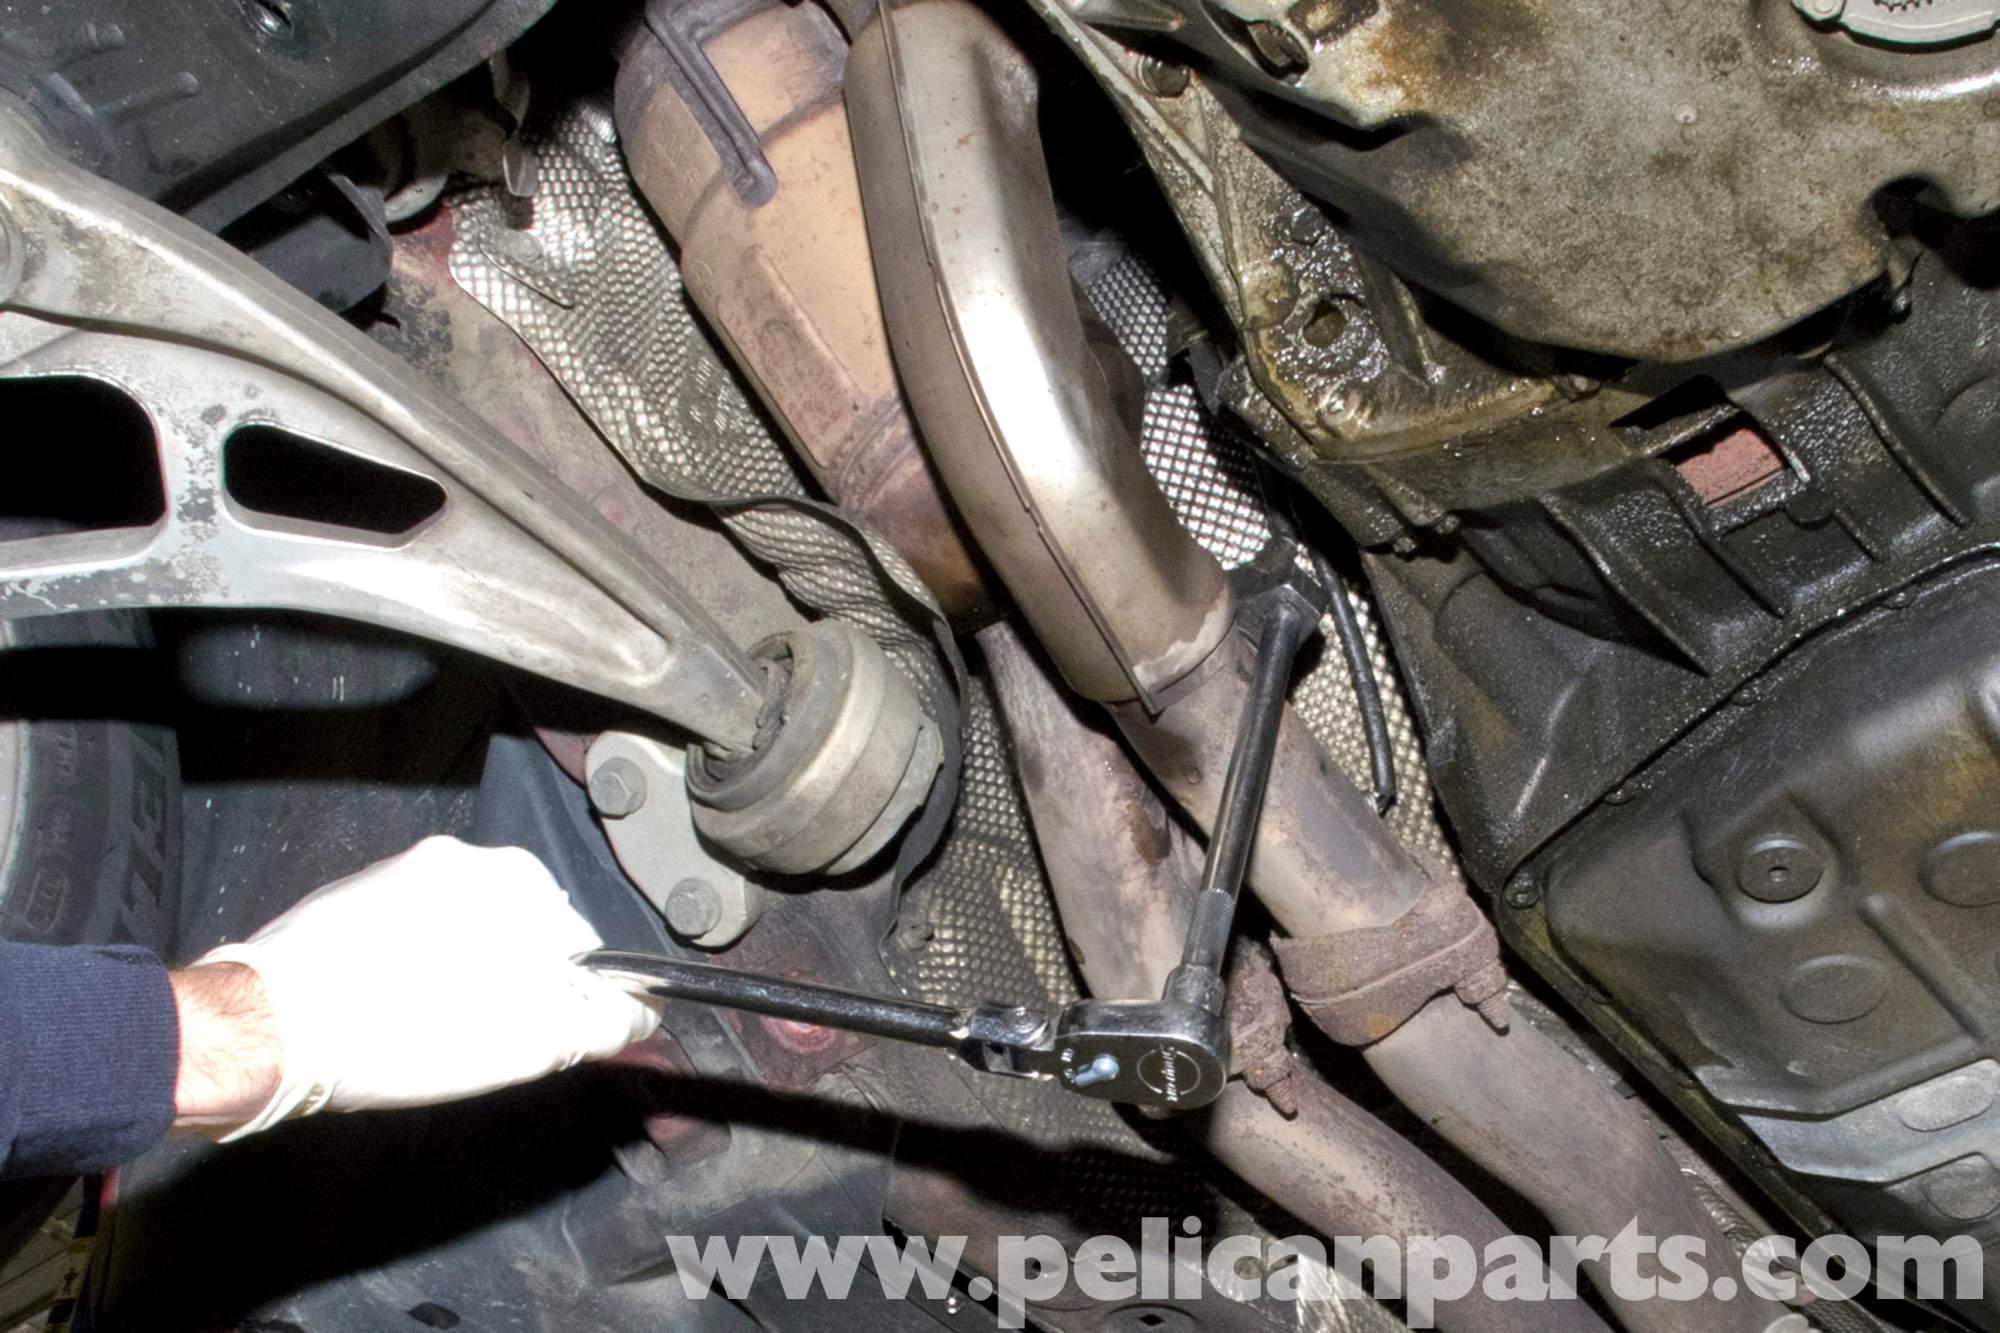 hight resolution of bmw e46 oxygen sensor replacement bmw 325i 2001 2005 1969 camaro engine wiring harness diagram e46